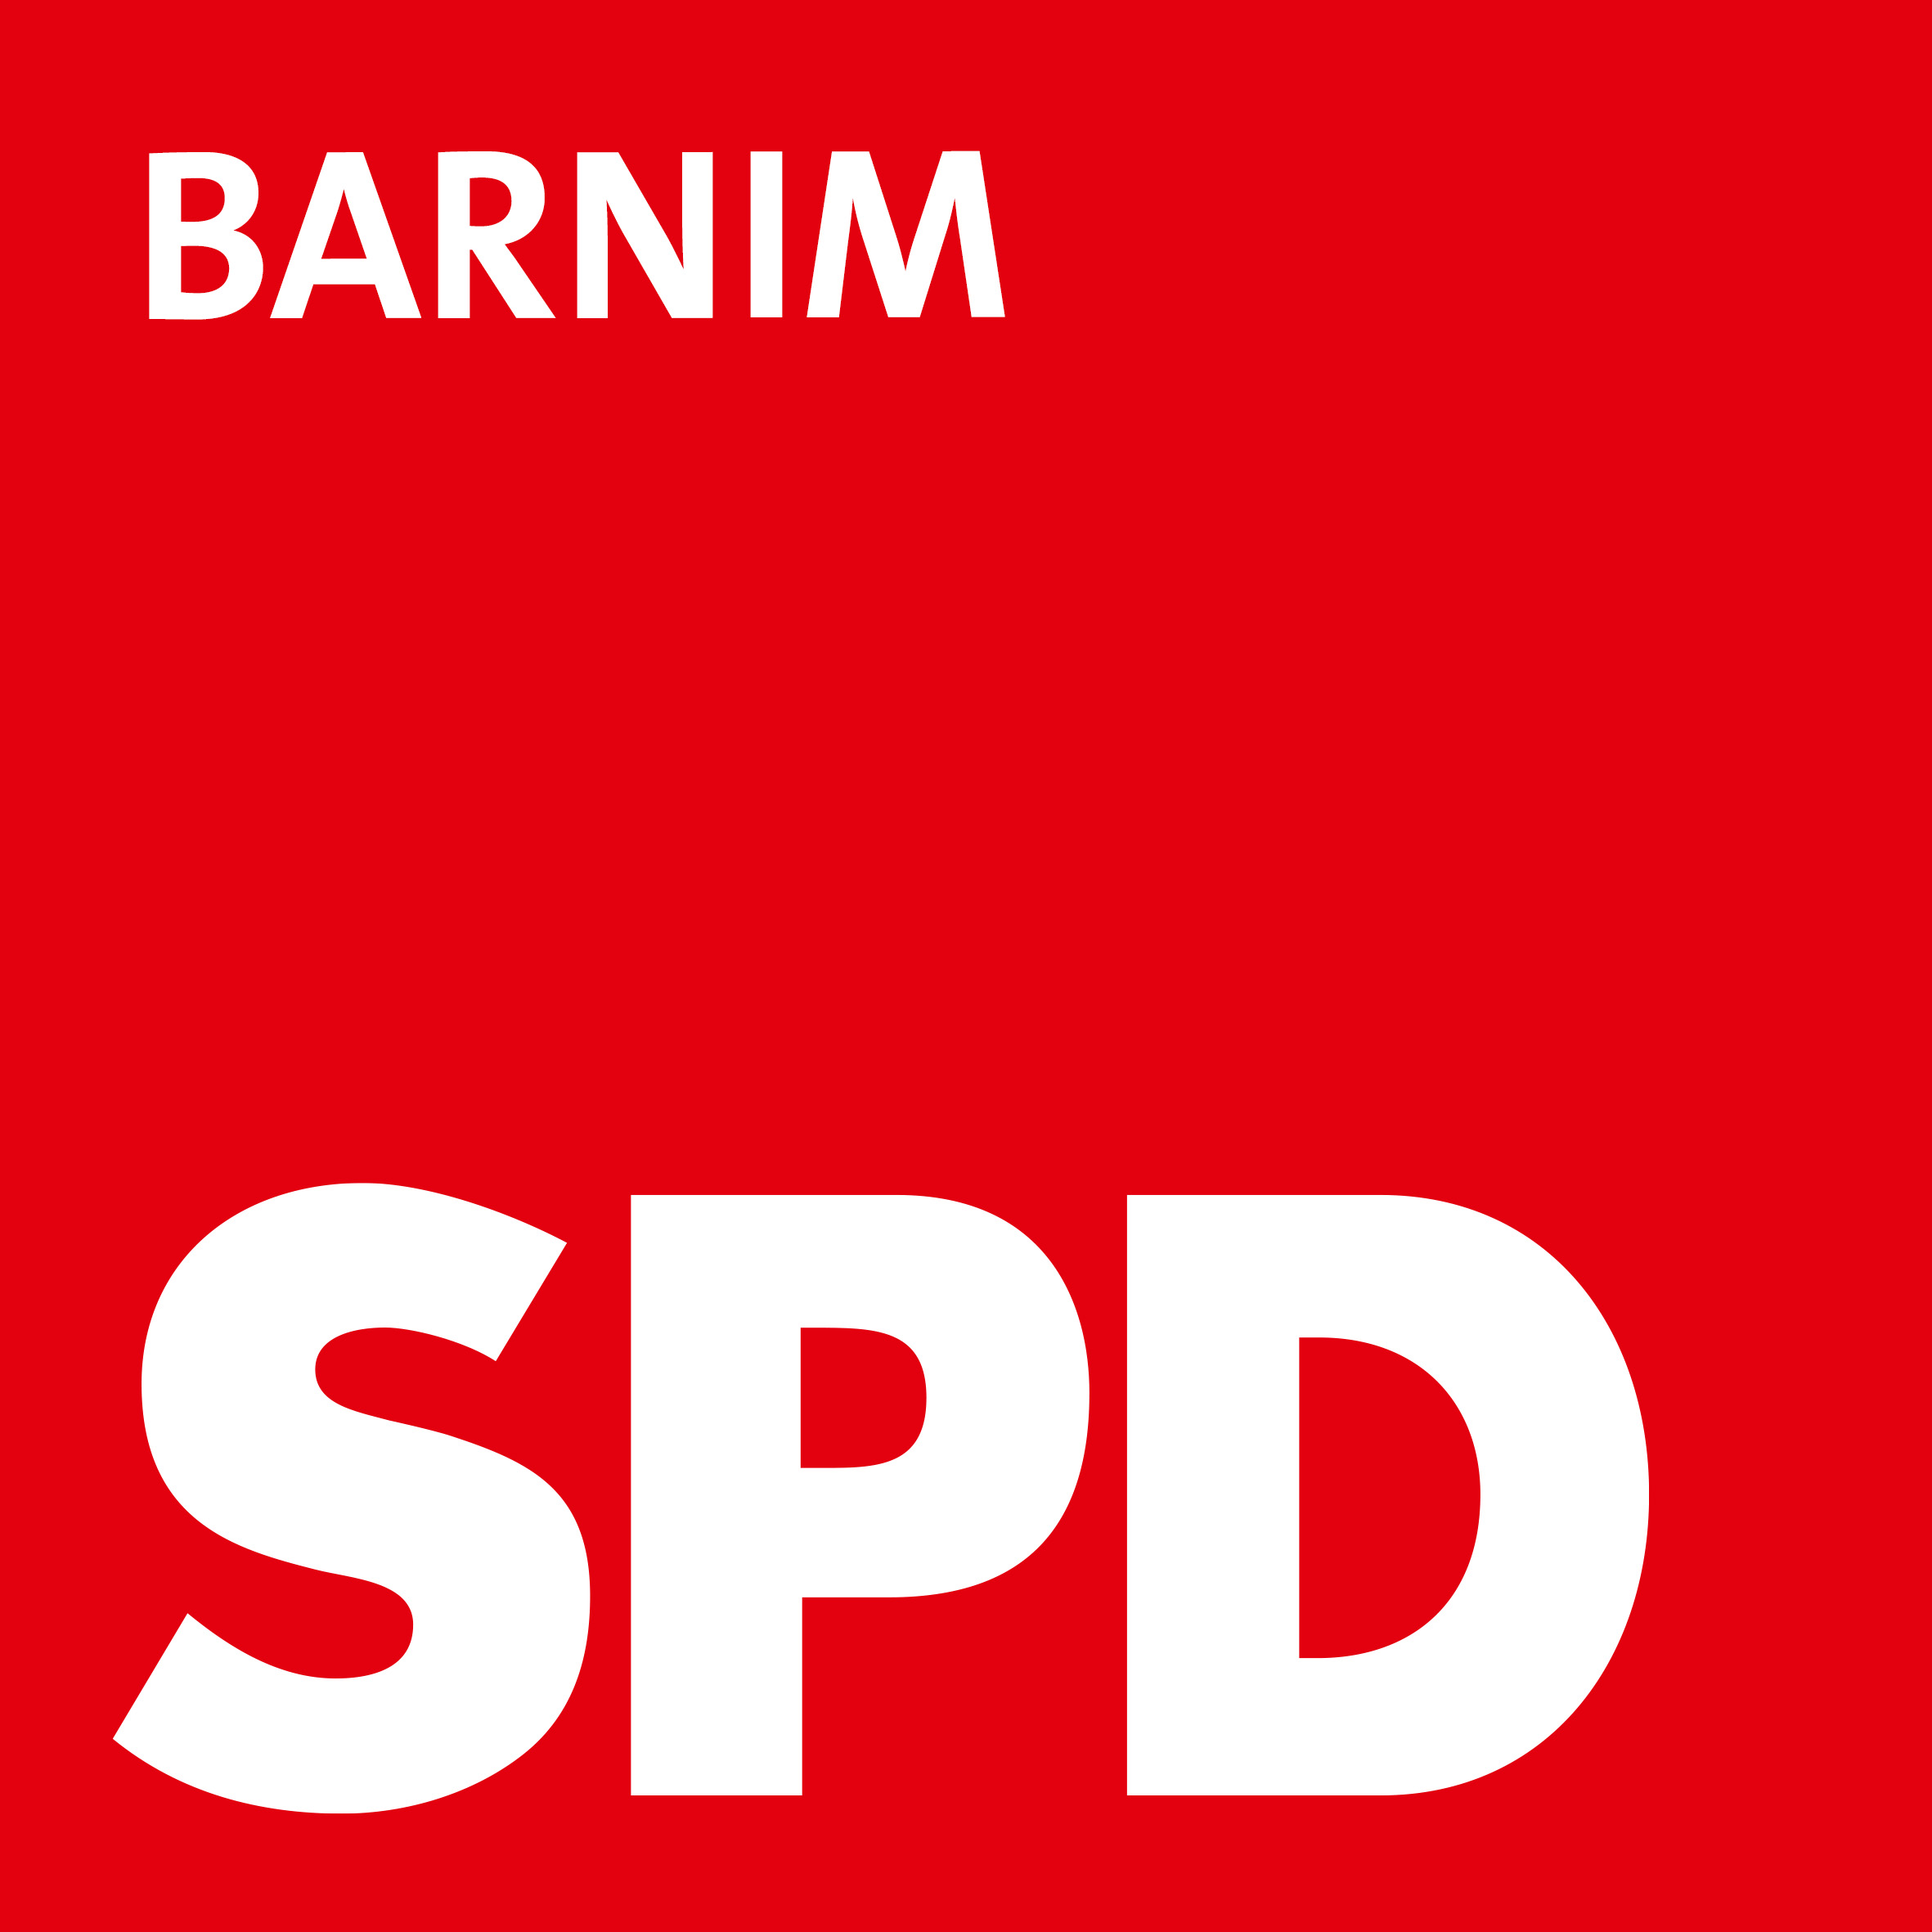 SPD Barnim